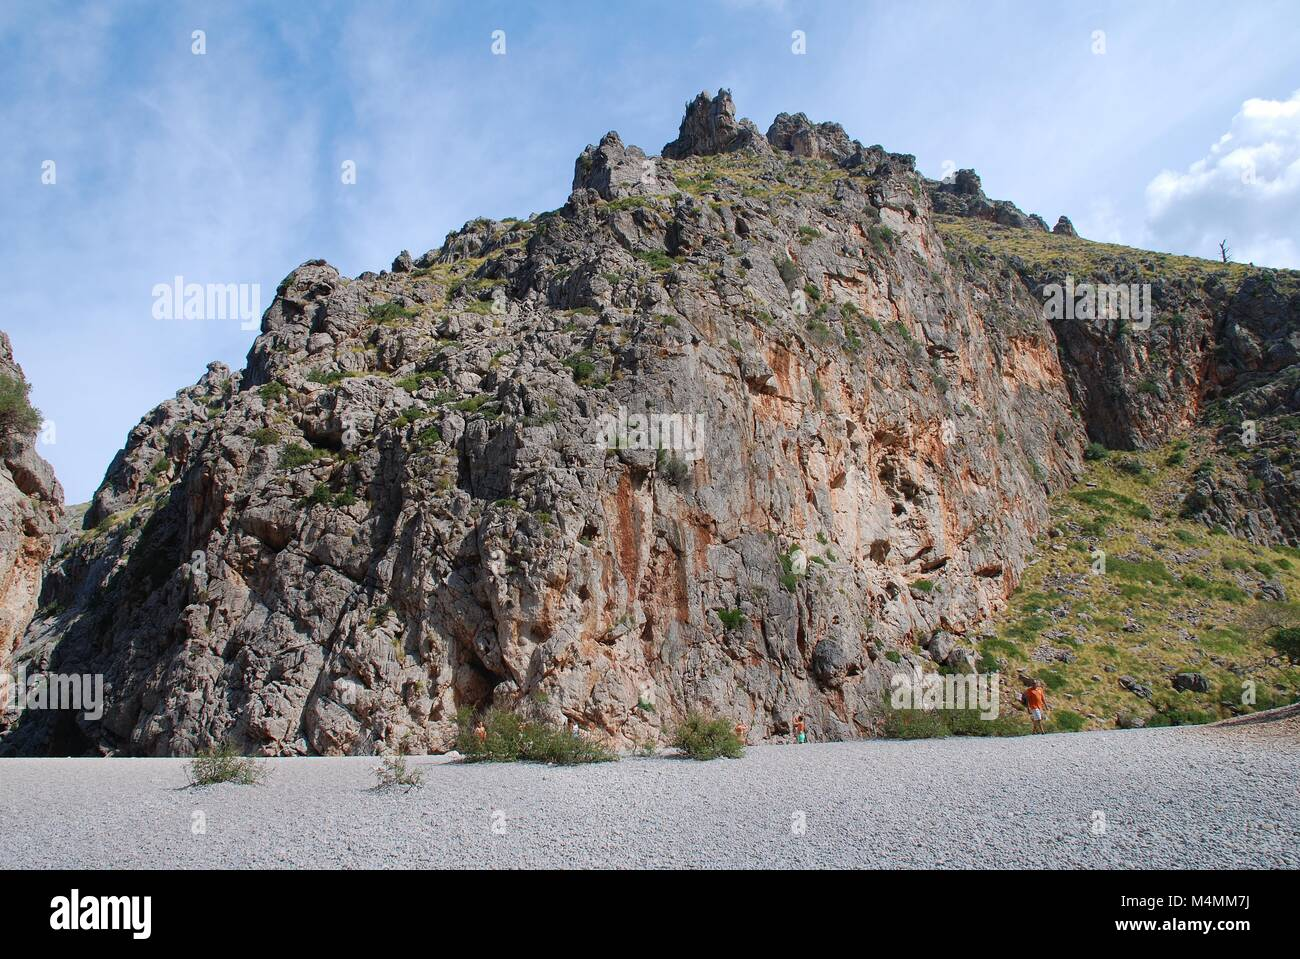 The Torrent de Pareis river gorge at Sa Calobra on the Spanish island of Majorca. - Stock Image